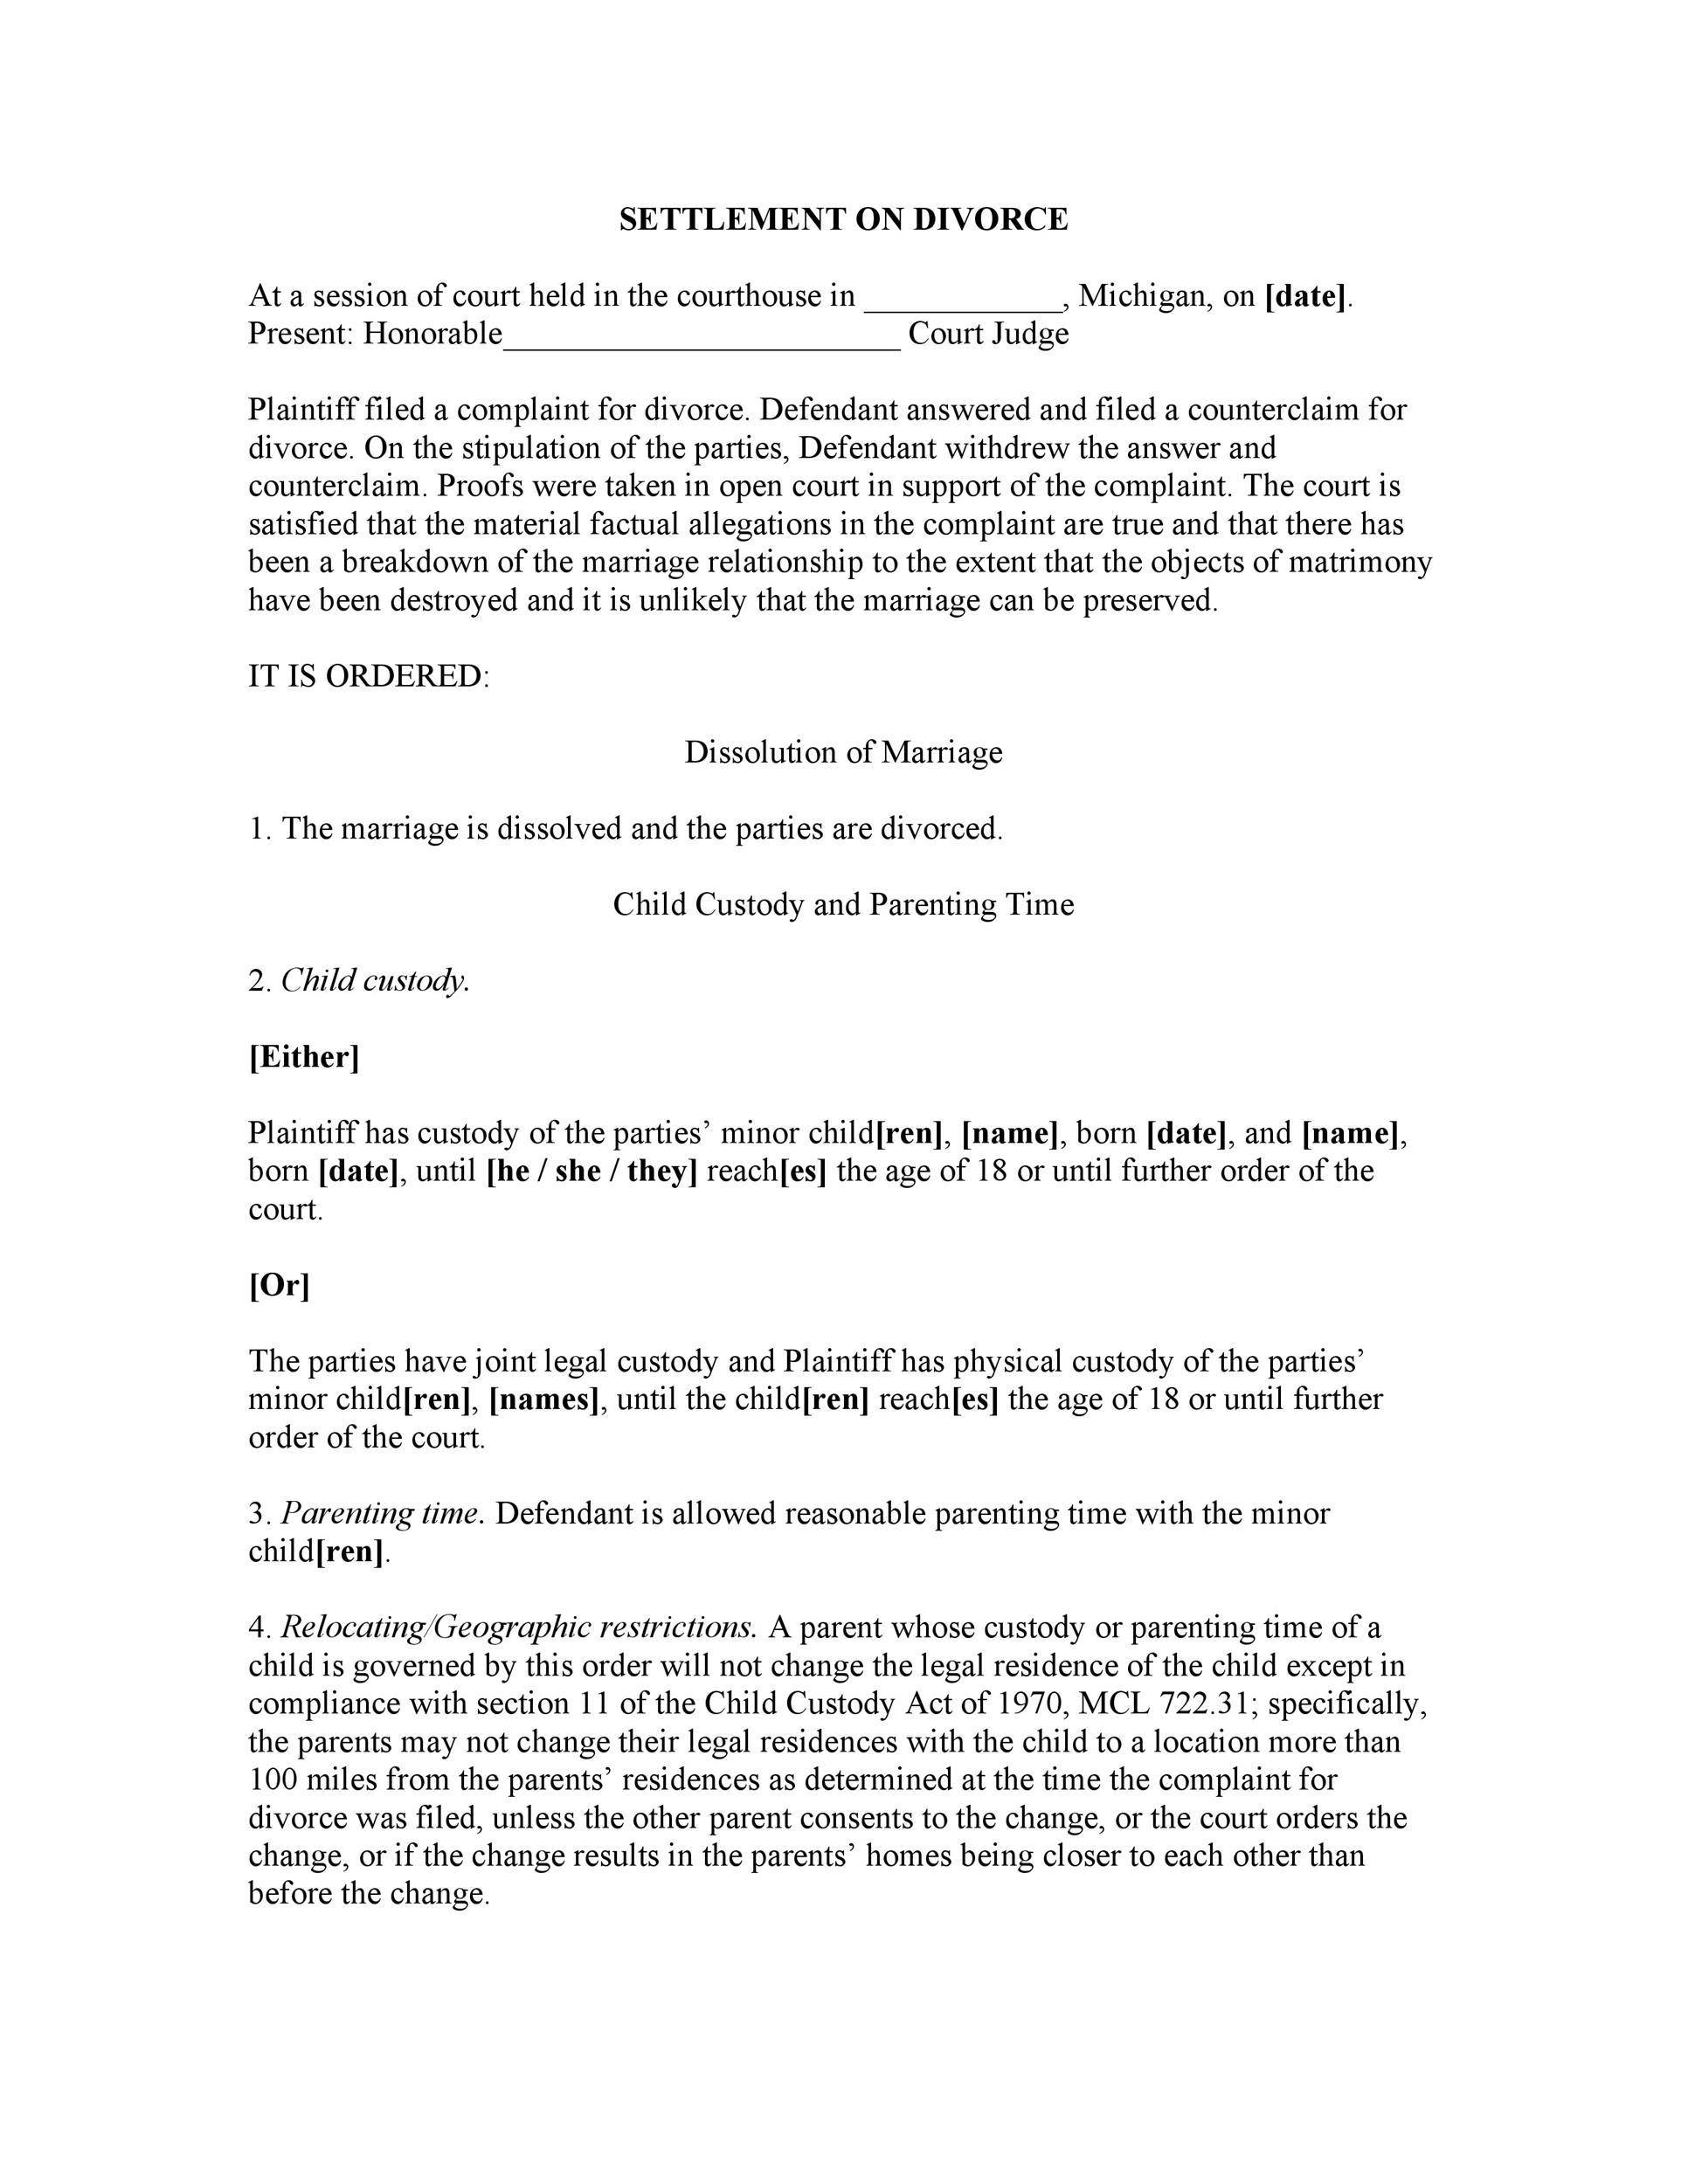 Free divorce agreement 31